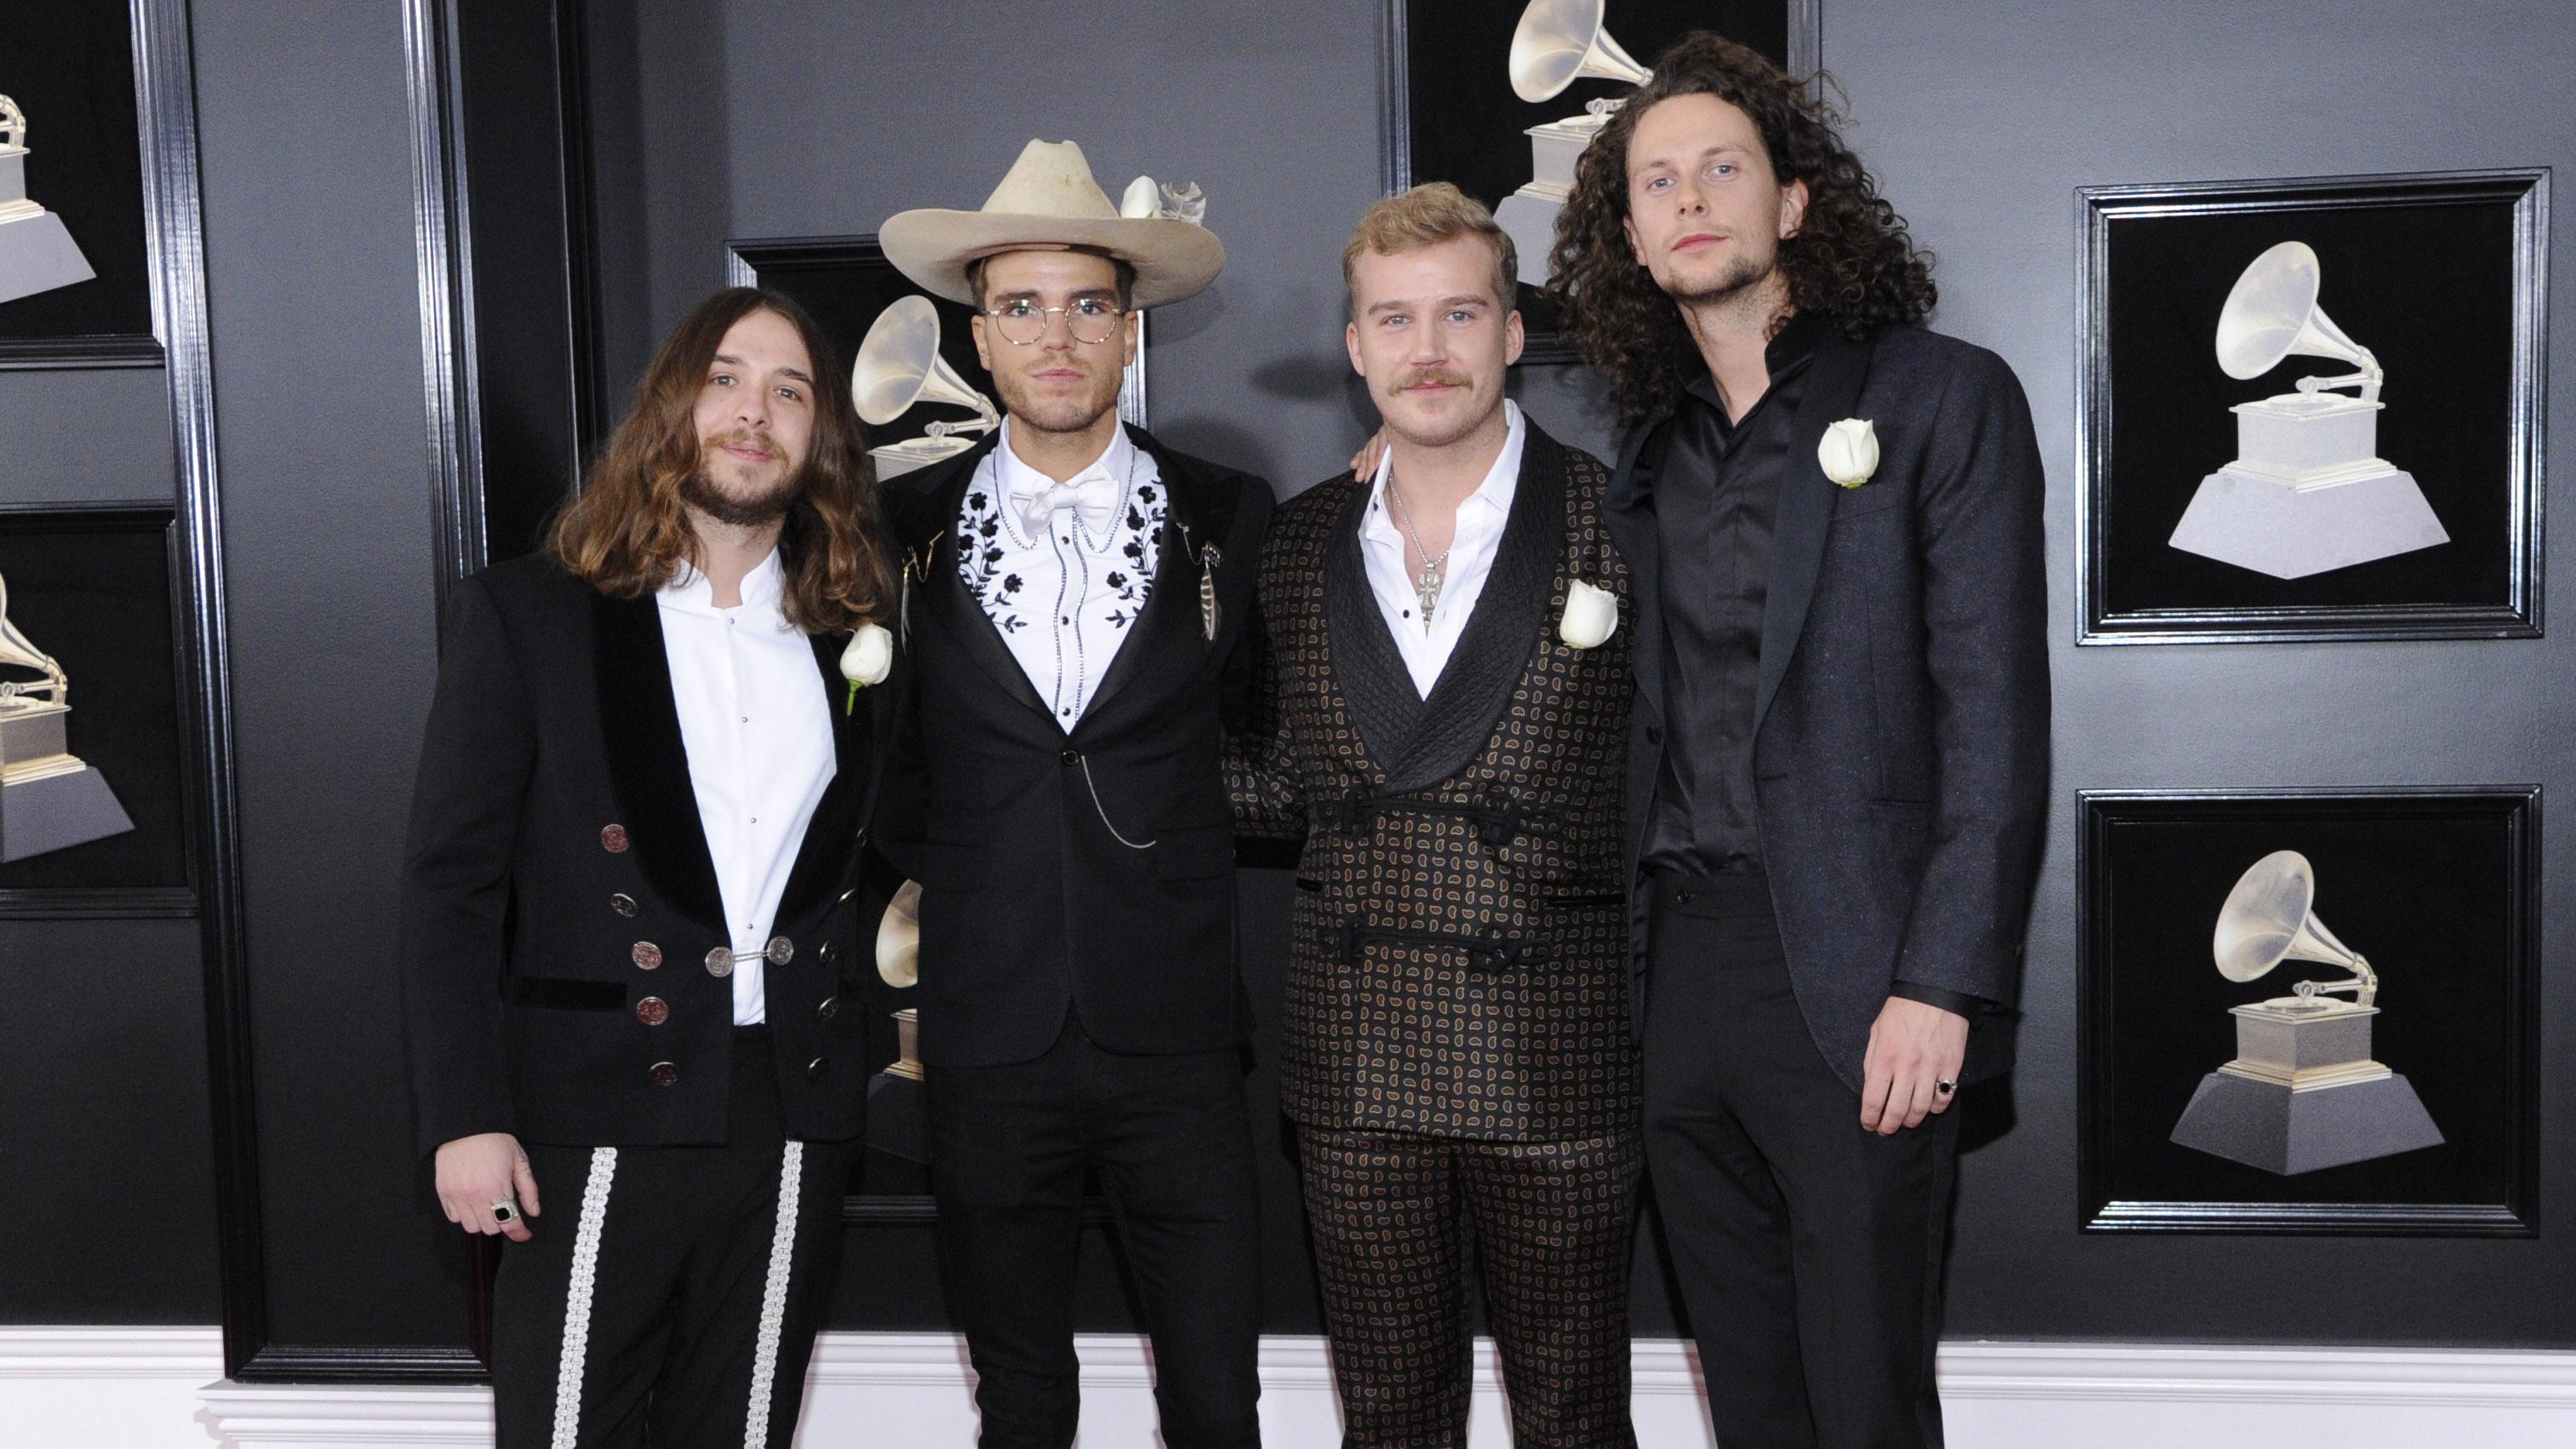 Icelandic blues-rock band Kaleo pose together before walking into Madison Square Garden.